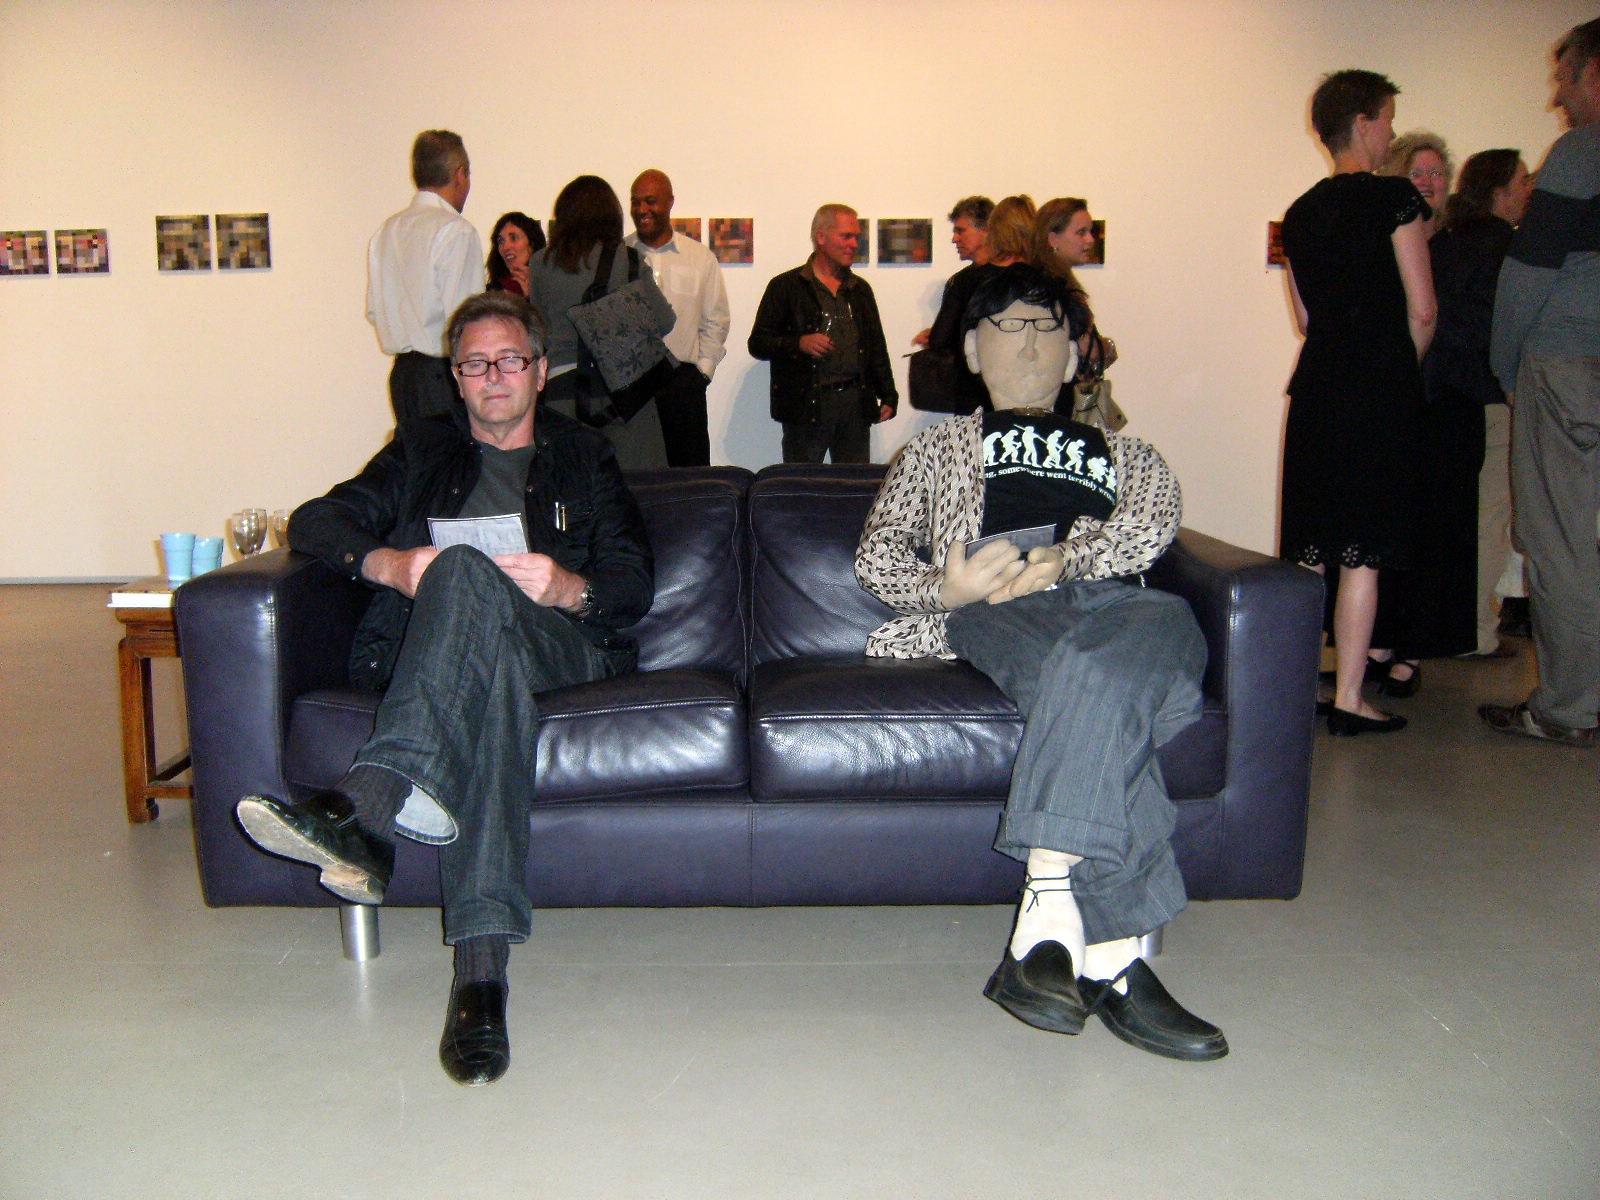 Gallery opening - Graeme & Som